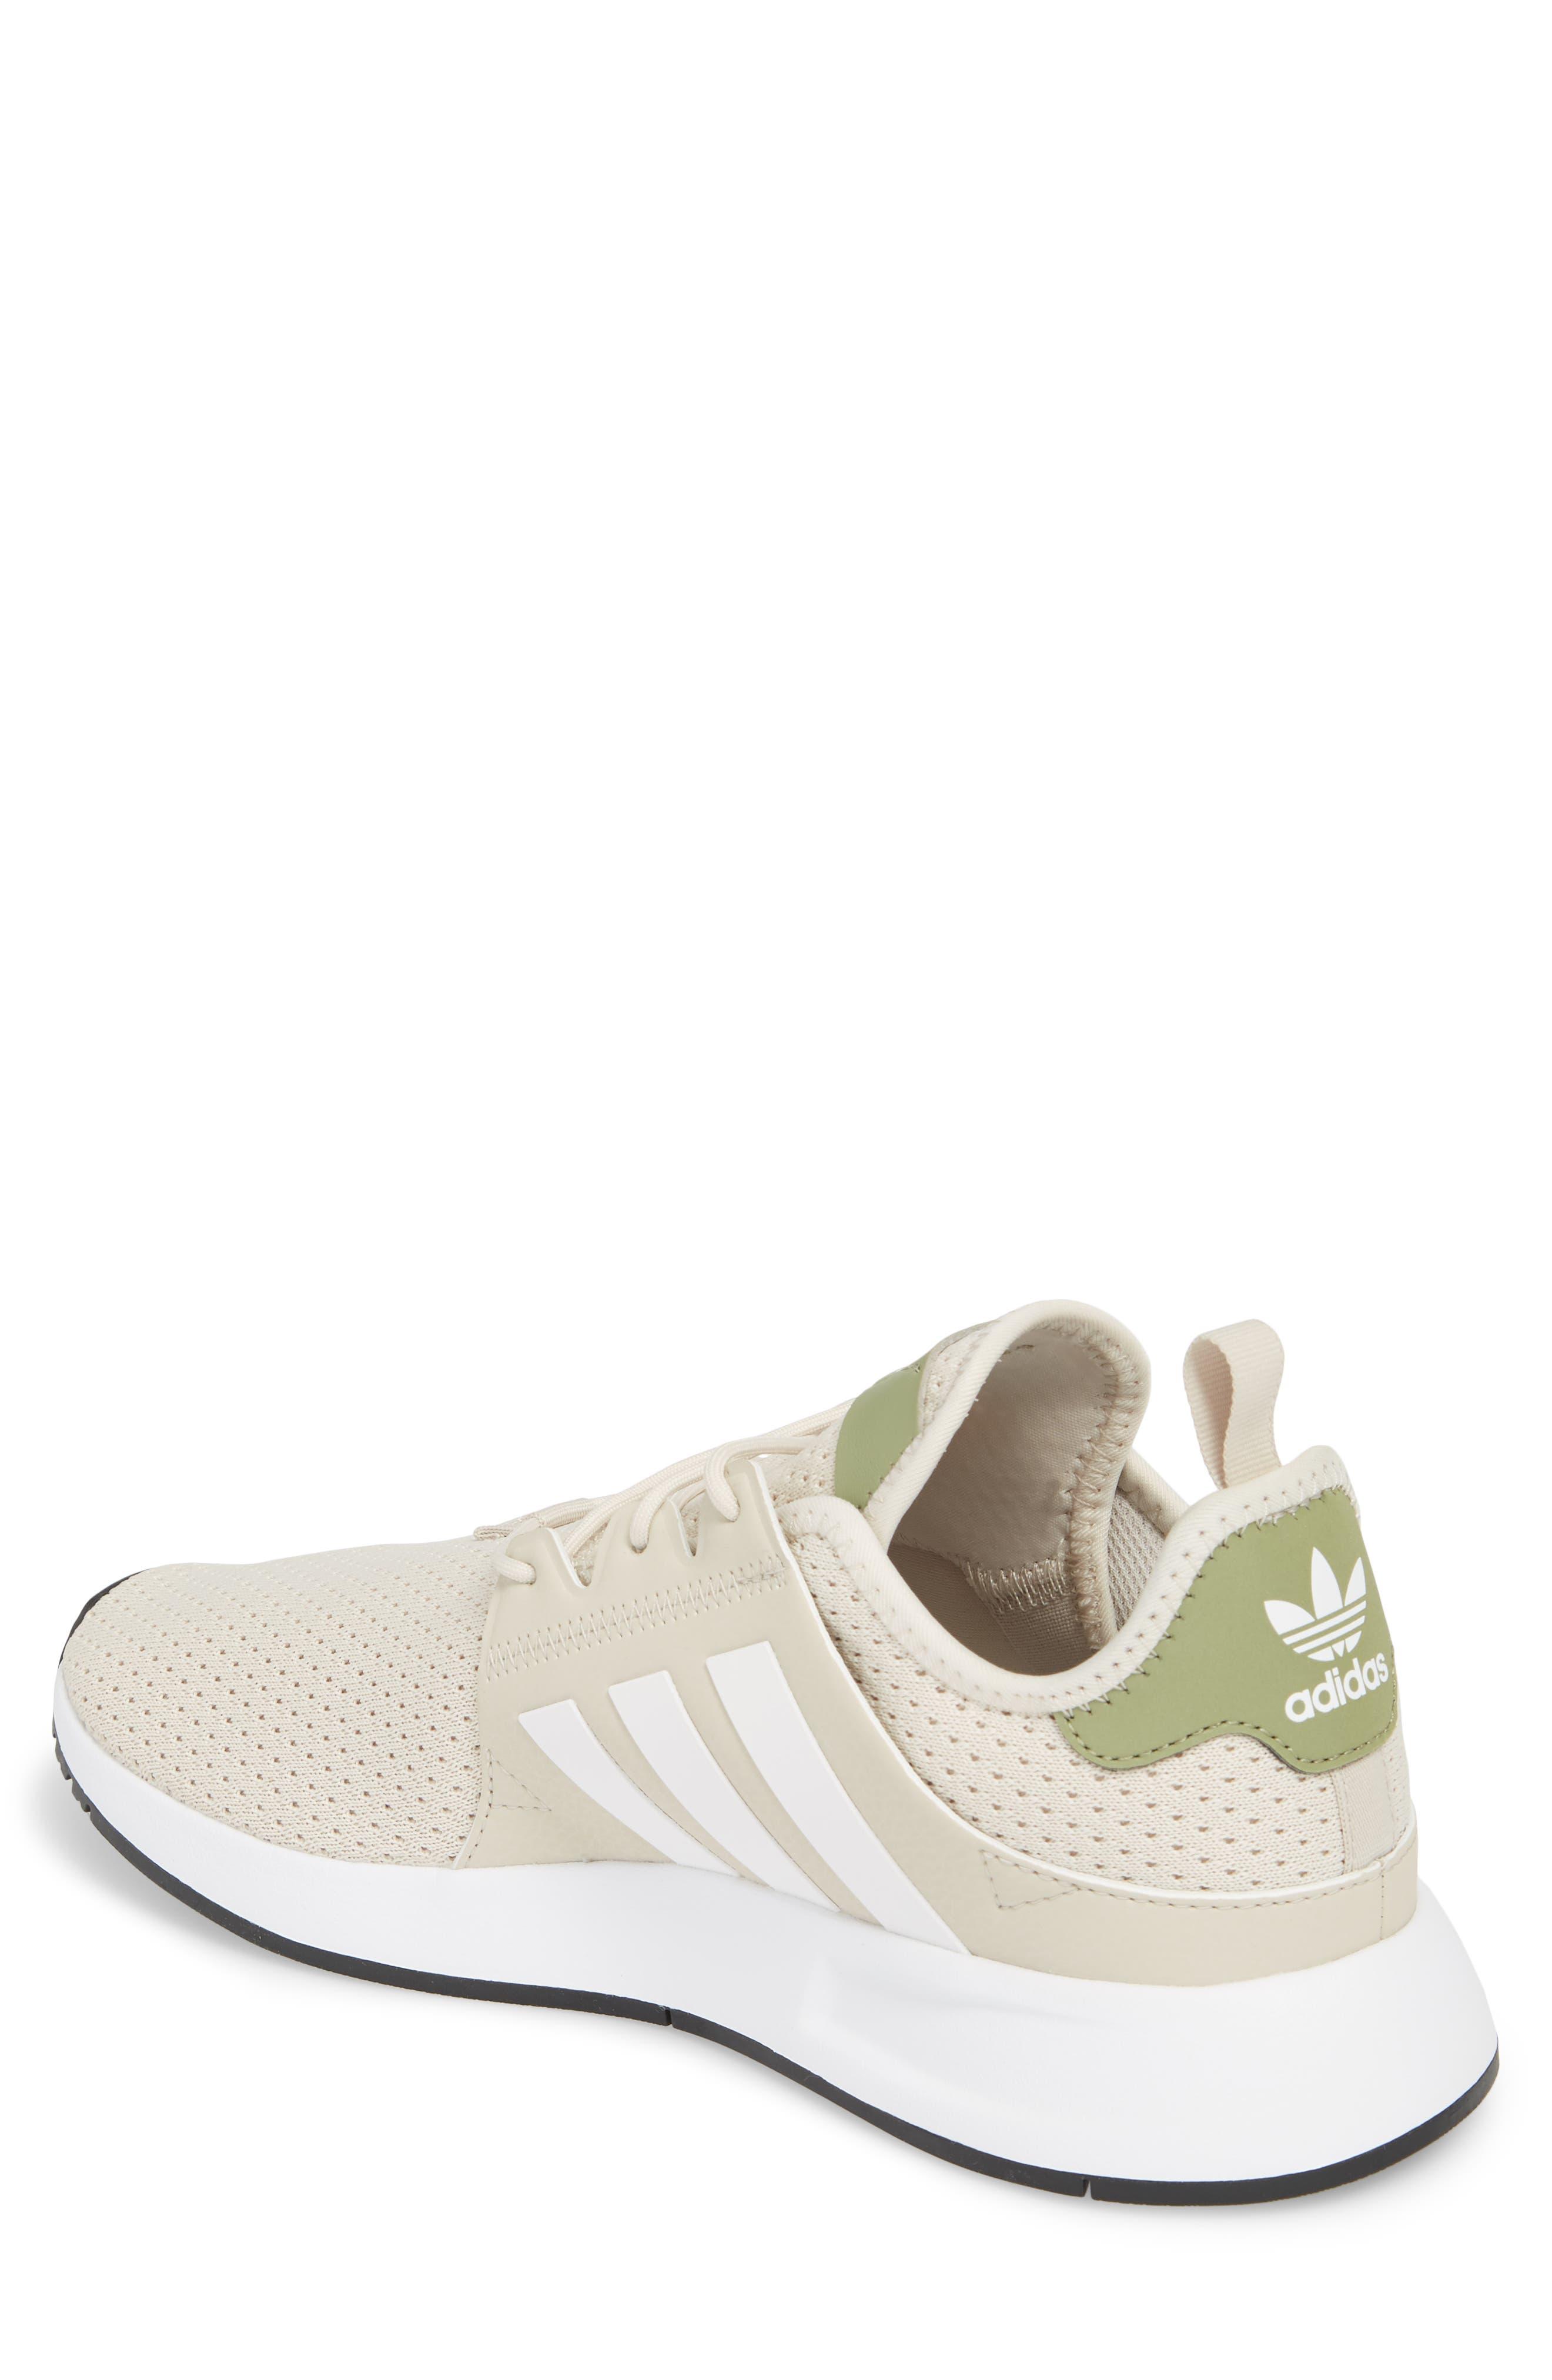 X_PLR Sneaker,                             Alternate thumbnail 2, color,                             Brown/ White / Trace Cargo